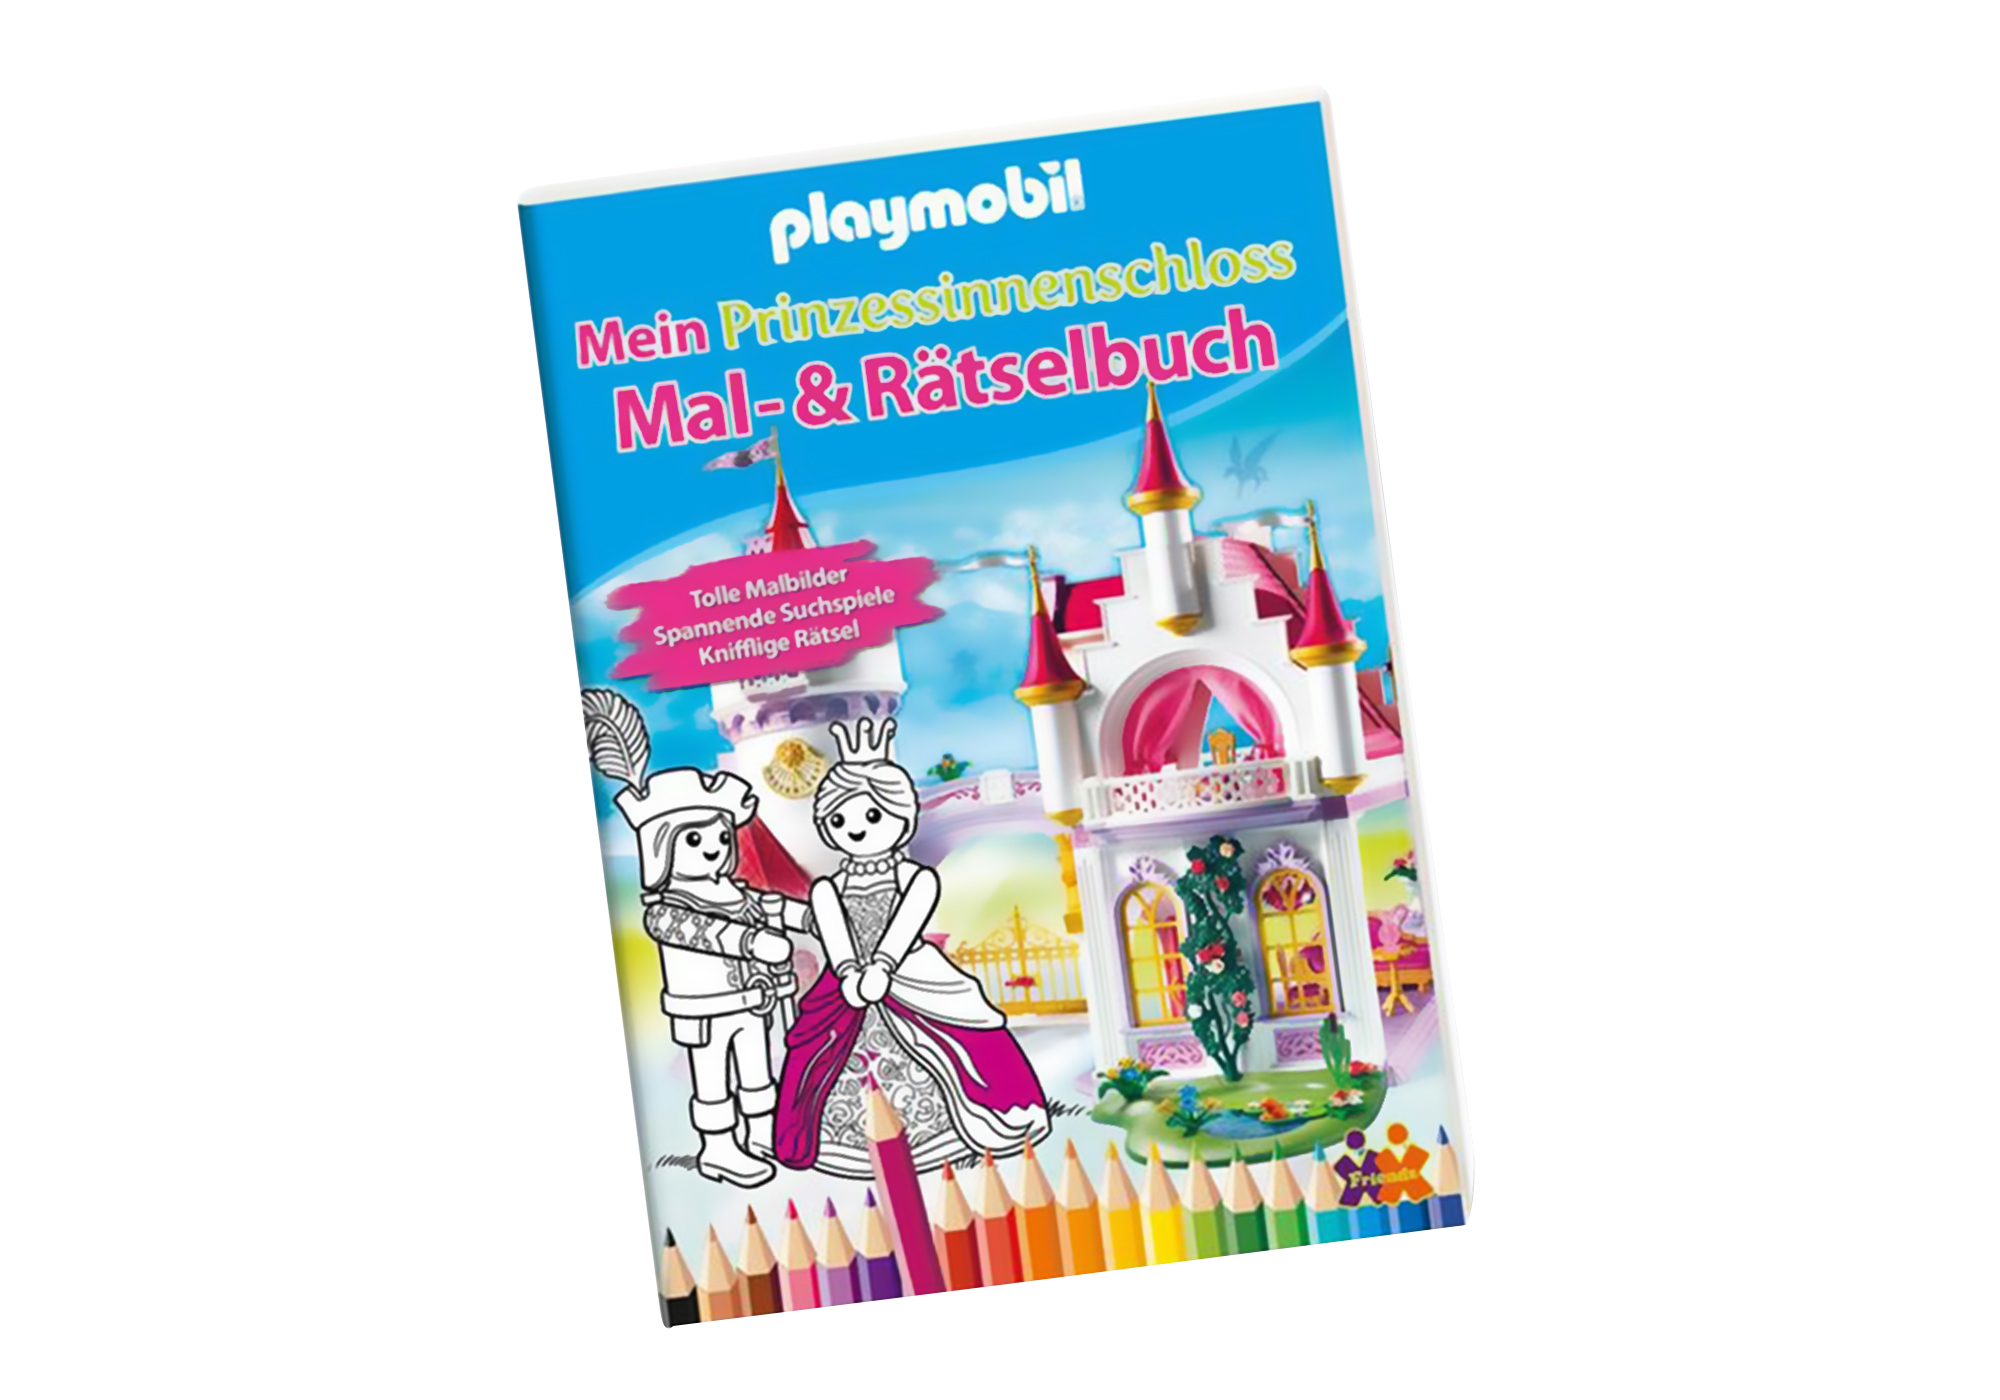 http://media.playmobil.com/i/playmobil/80441_product_detail